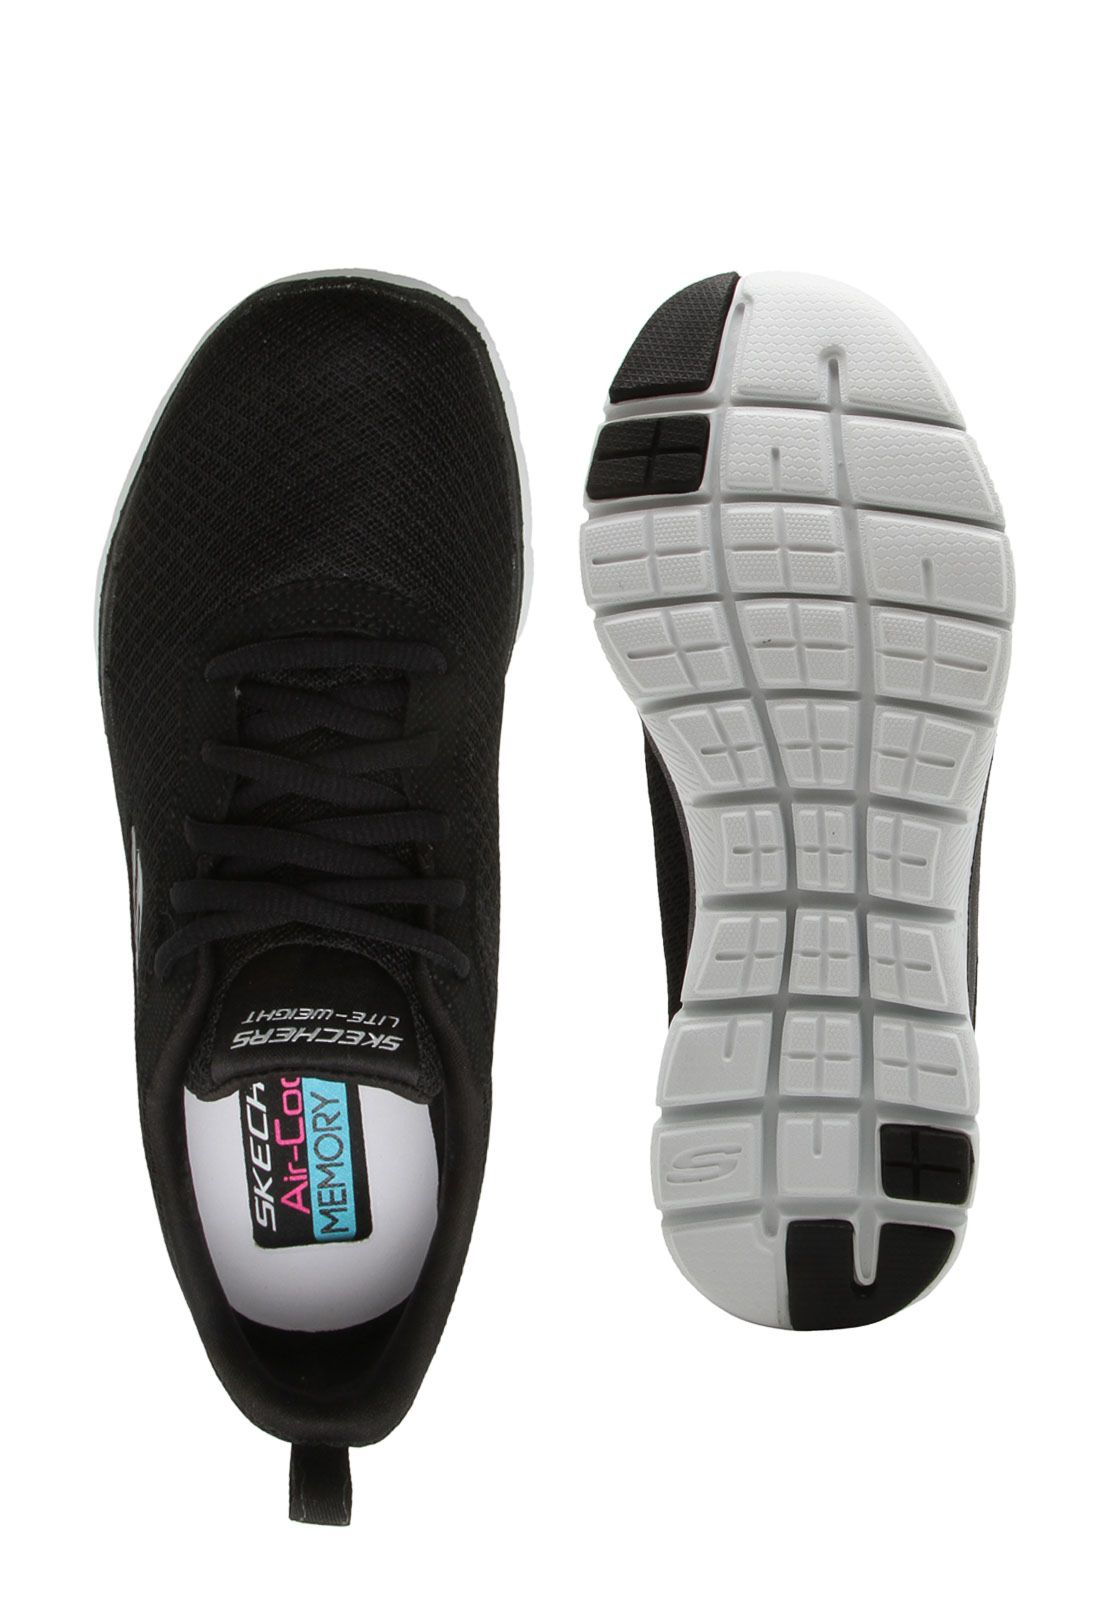 50fcaa9158 Tênis Skechers Flex Appeal 2.0 Feminino - black - Titanes Esportes